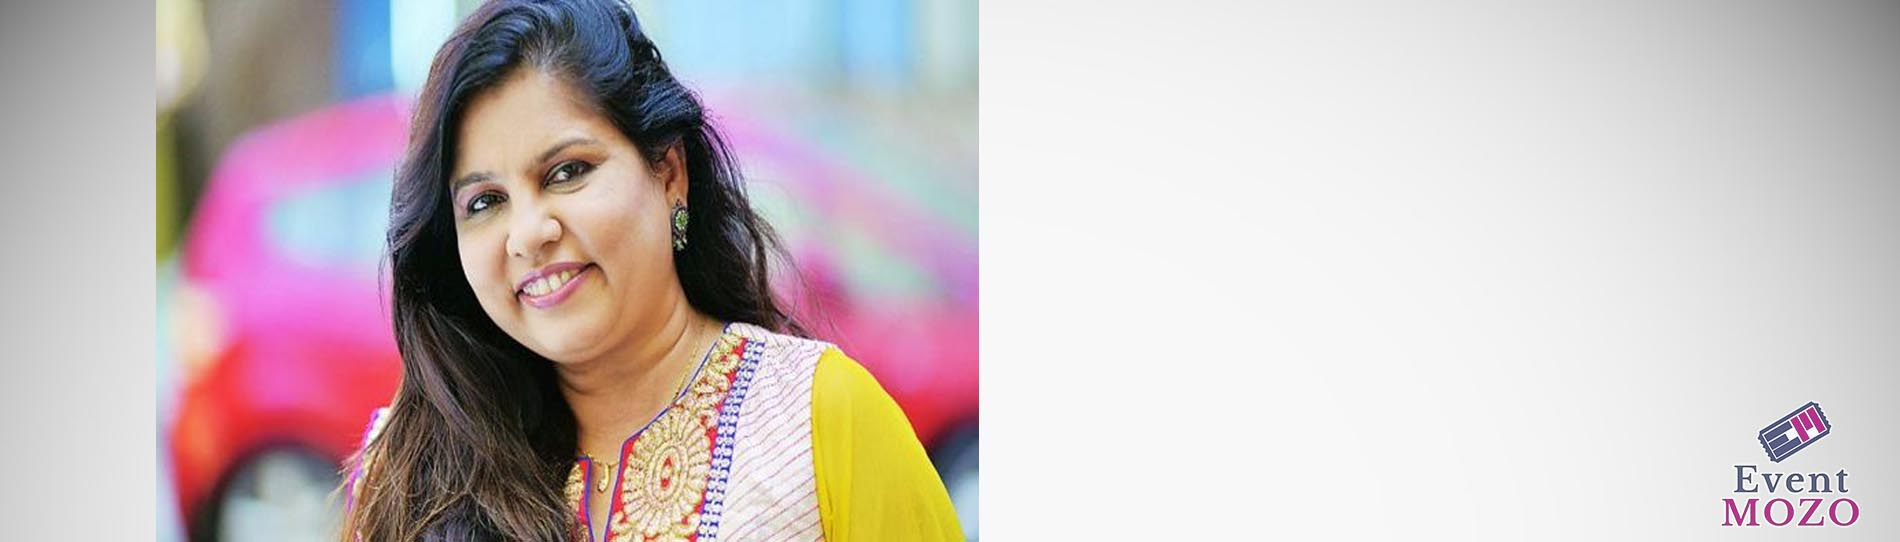 EventMozo Sadhana Sargam and Abhijit Ghoshal